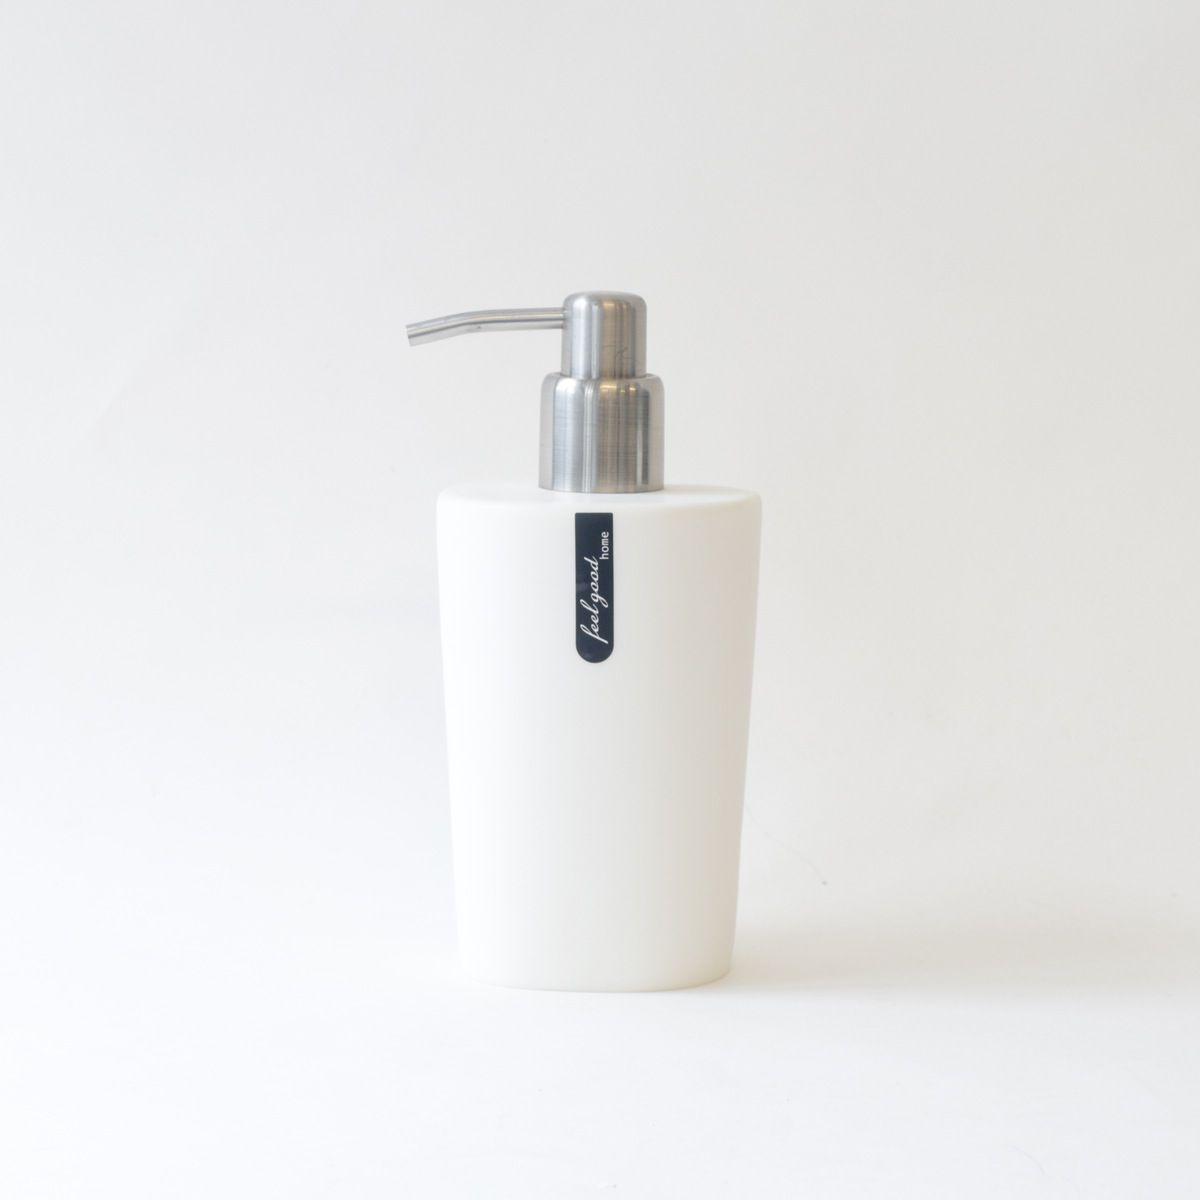 Zenspa - Gel Dispenser | Natural stones and Bathroom accessories